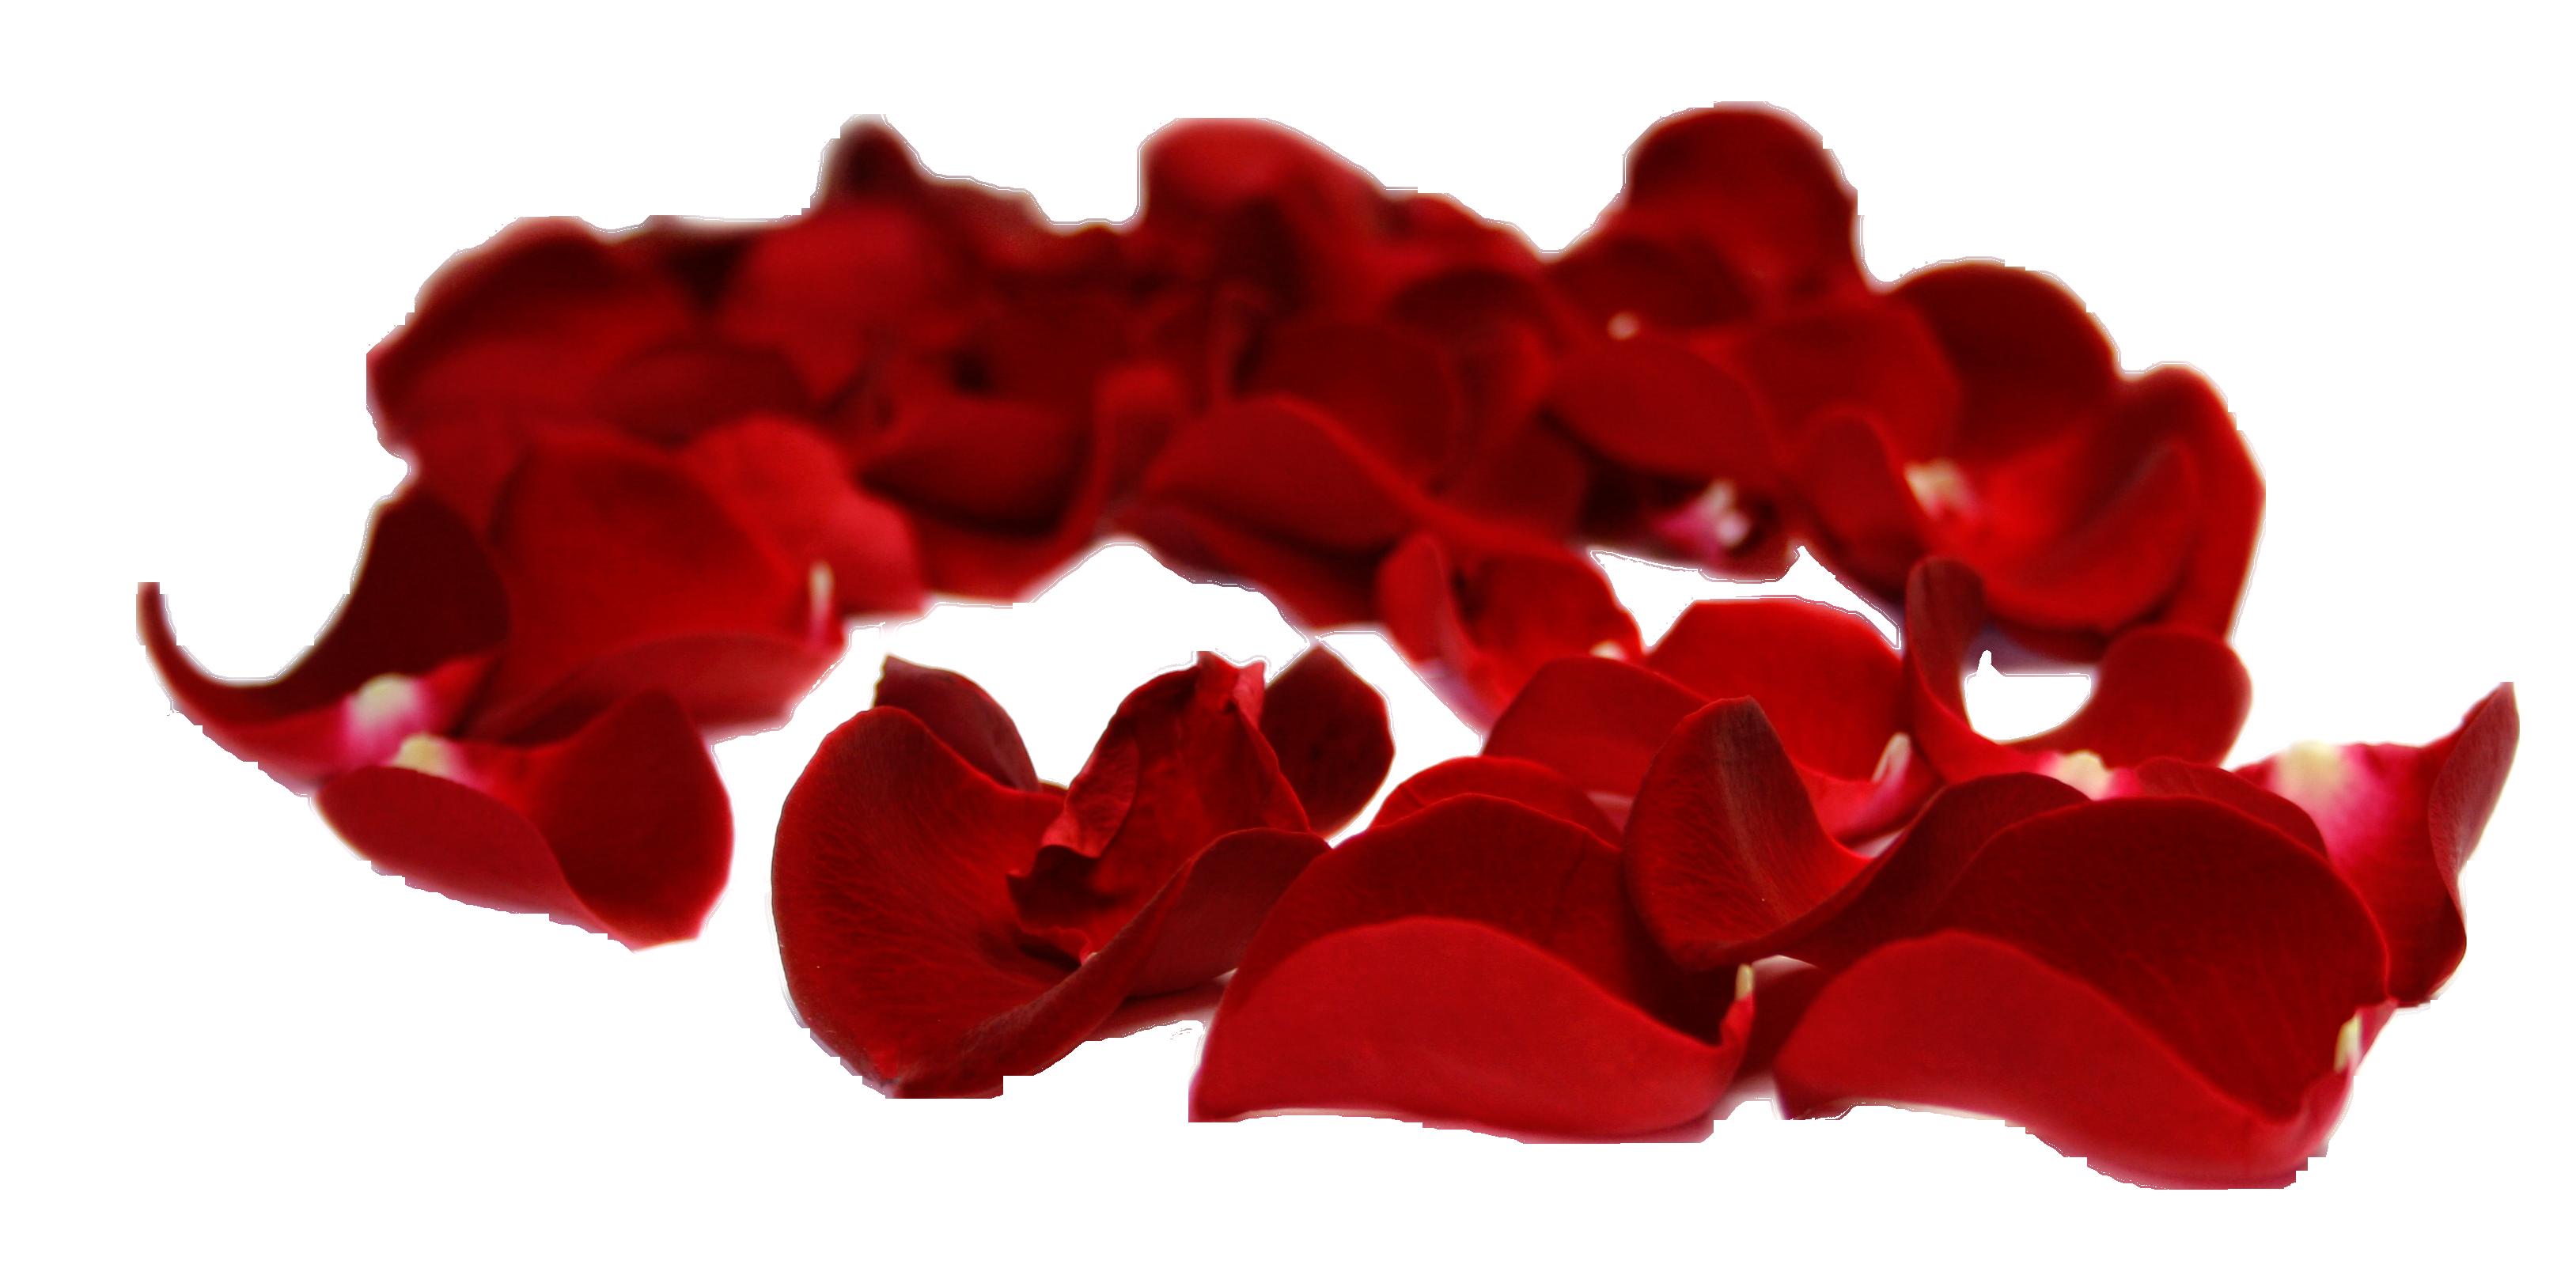 Rose Petals PSD, PNG with Transparent Background